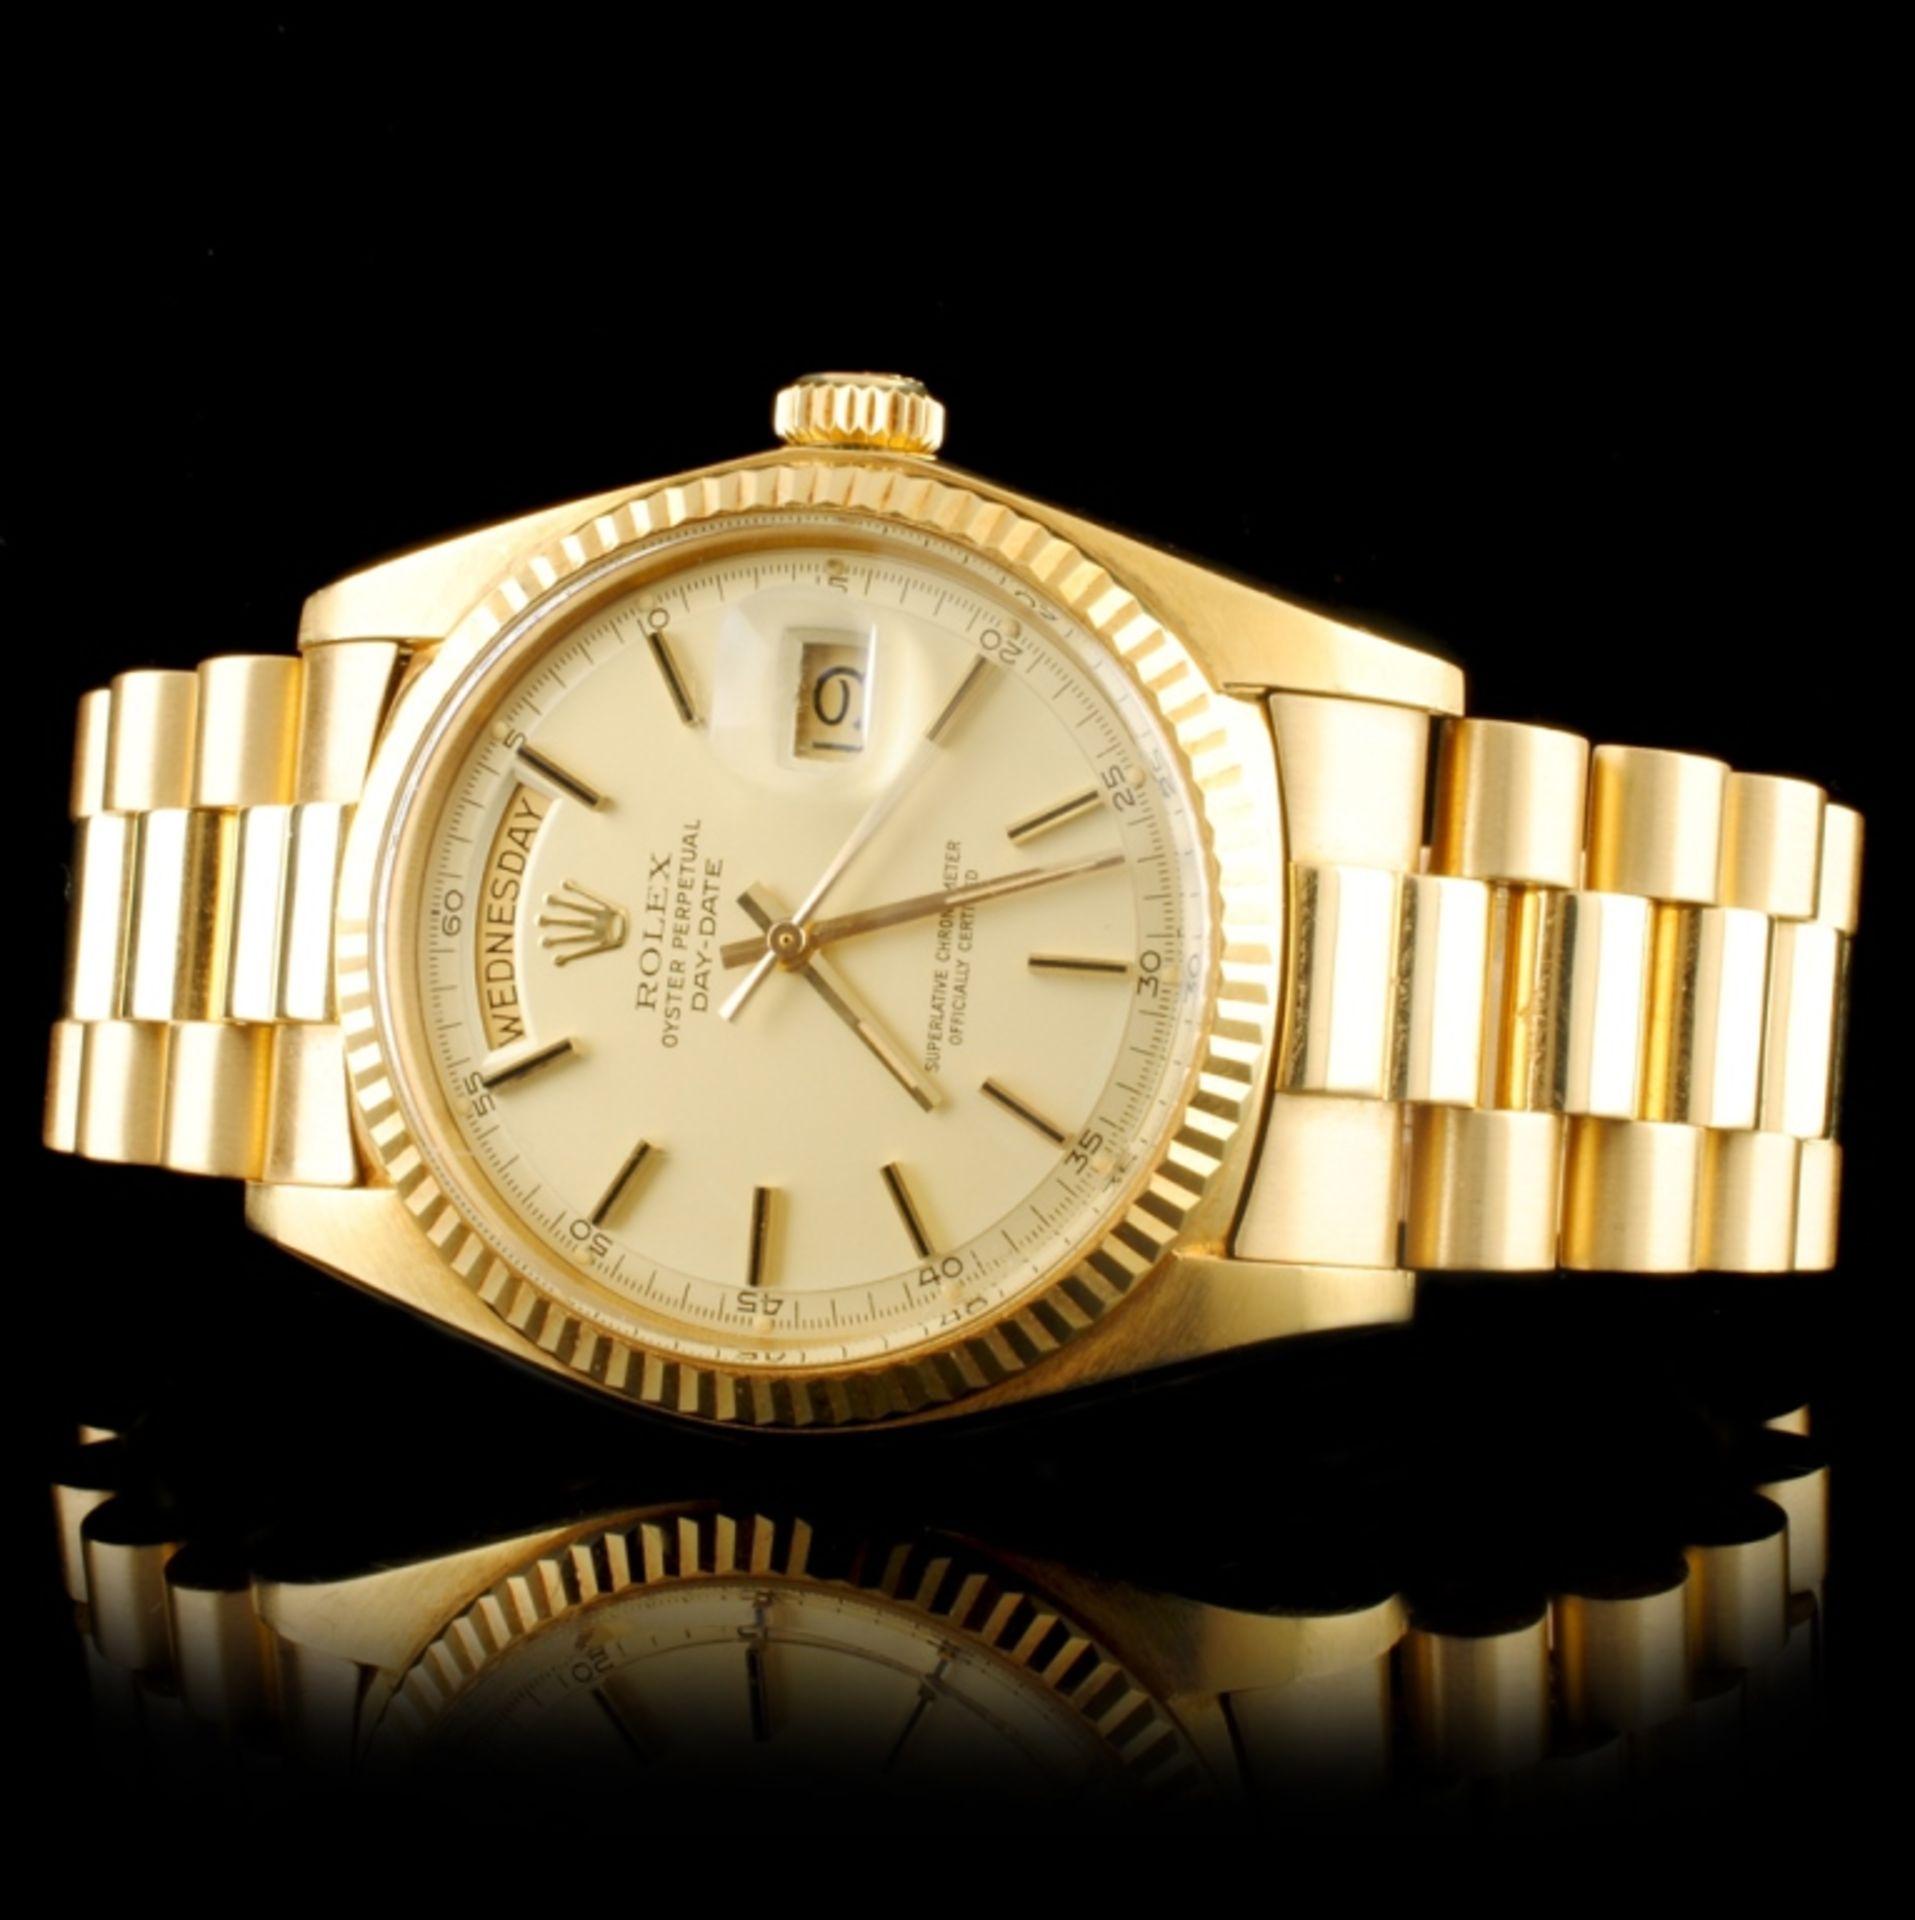 Rolex Day-Date 18K YG 36MM Wristwatch - Image 2 of 6